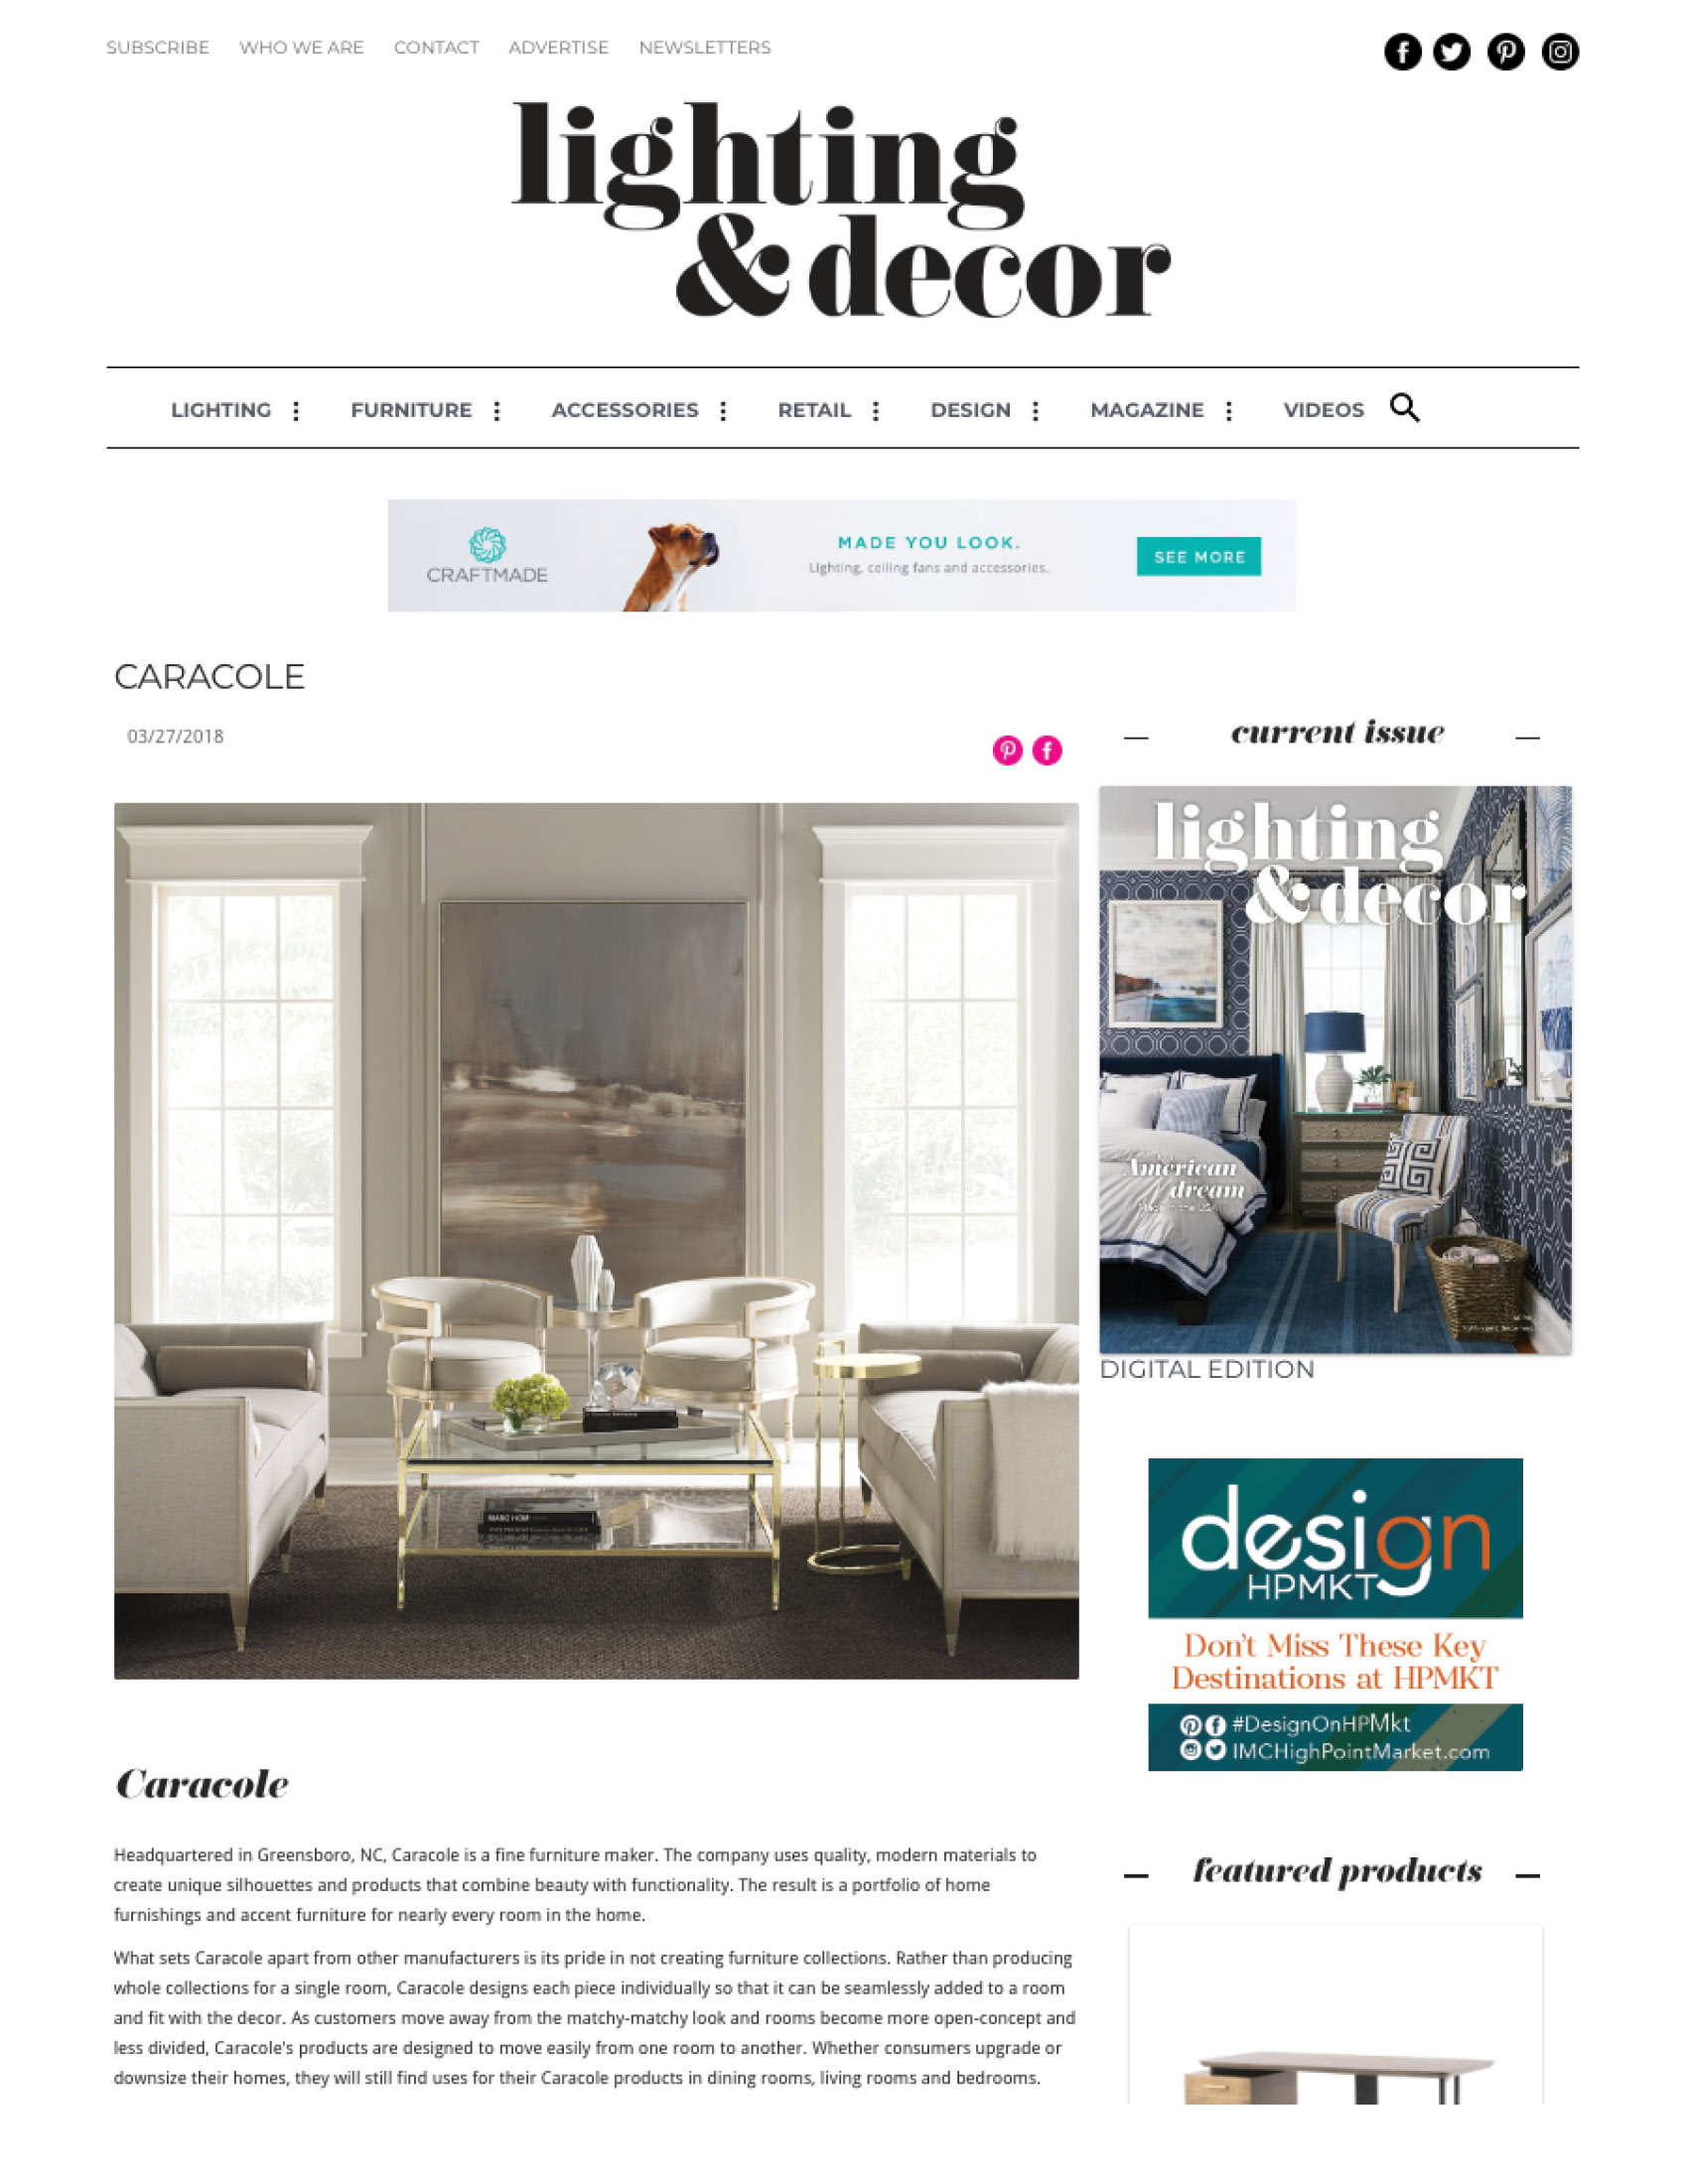 Lighting & Decor Online, March 2018